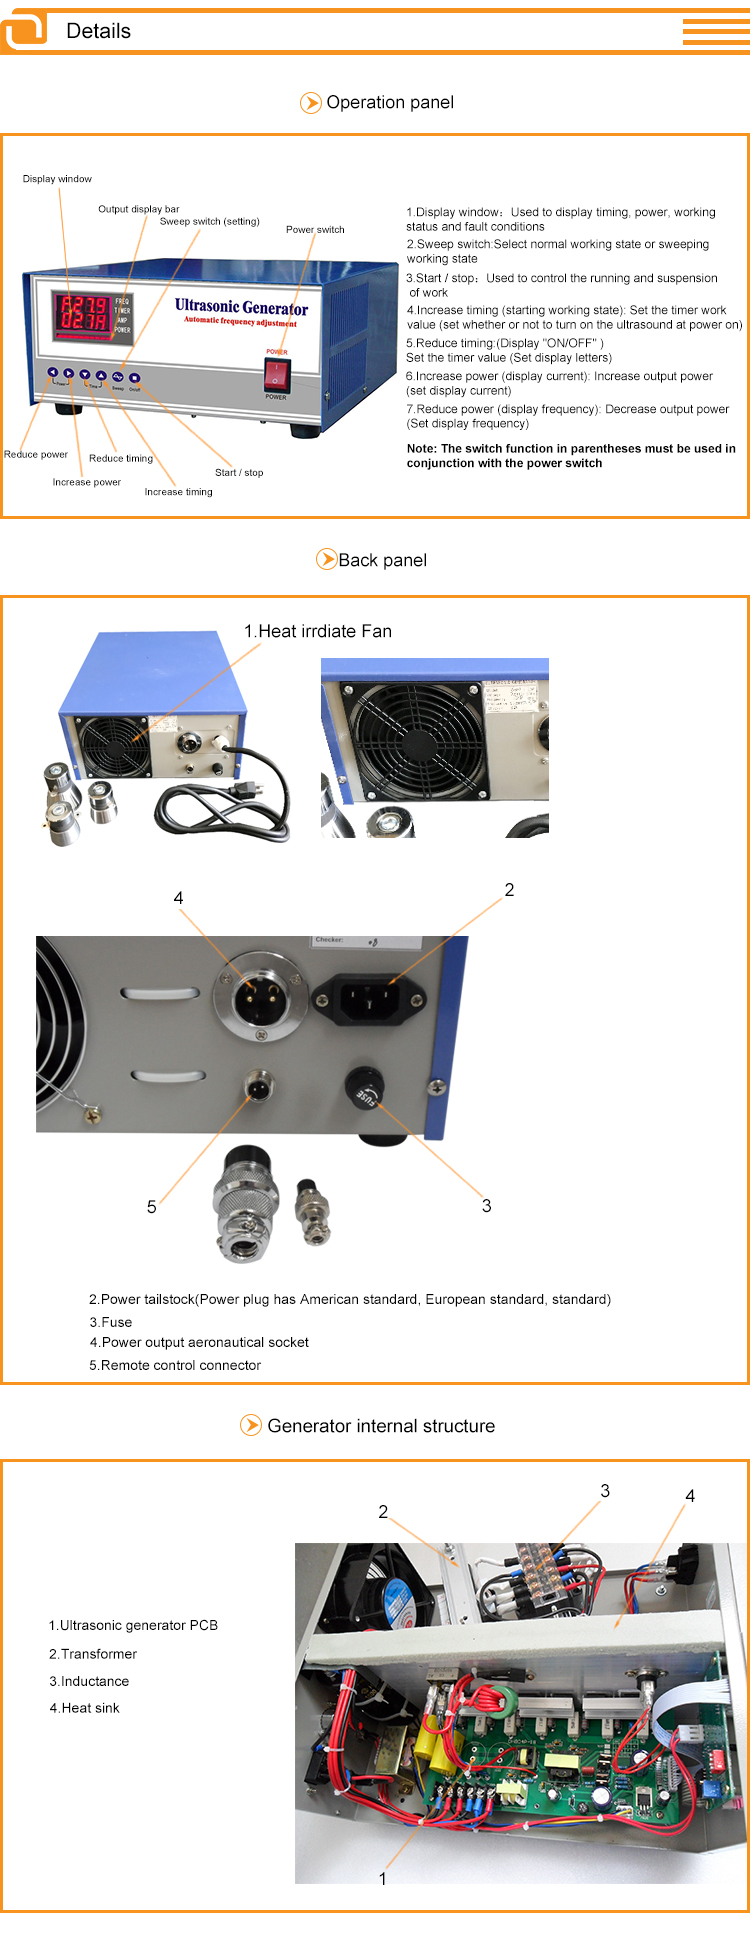 17KHz-200KHz High frequency ultrasonic generator ultrasonic cleaner generator